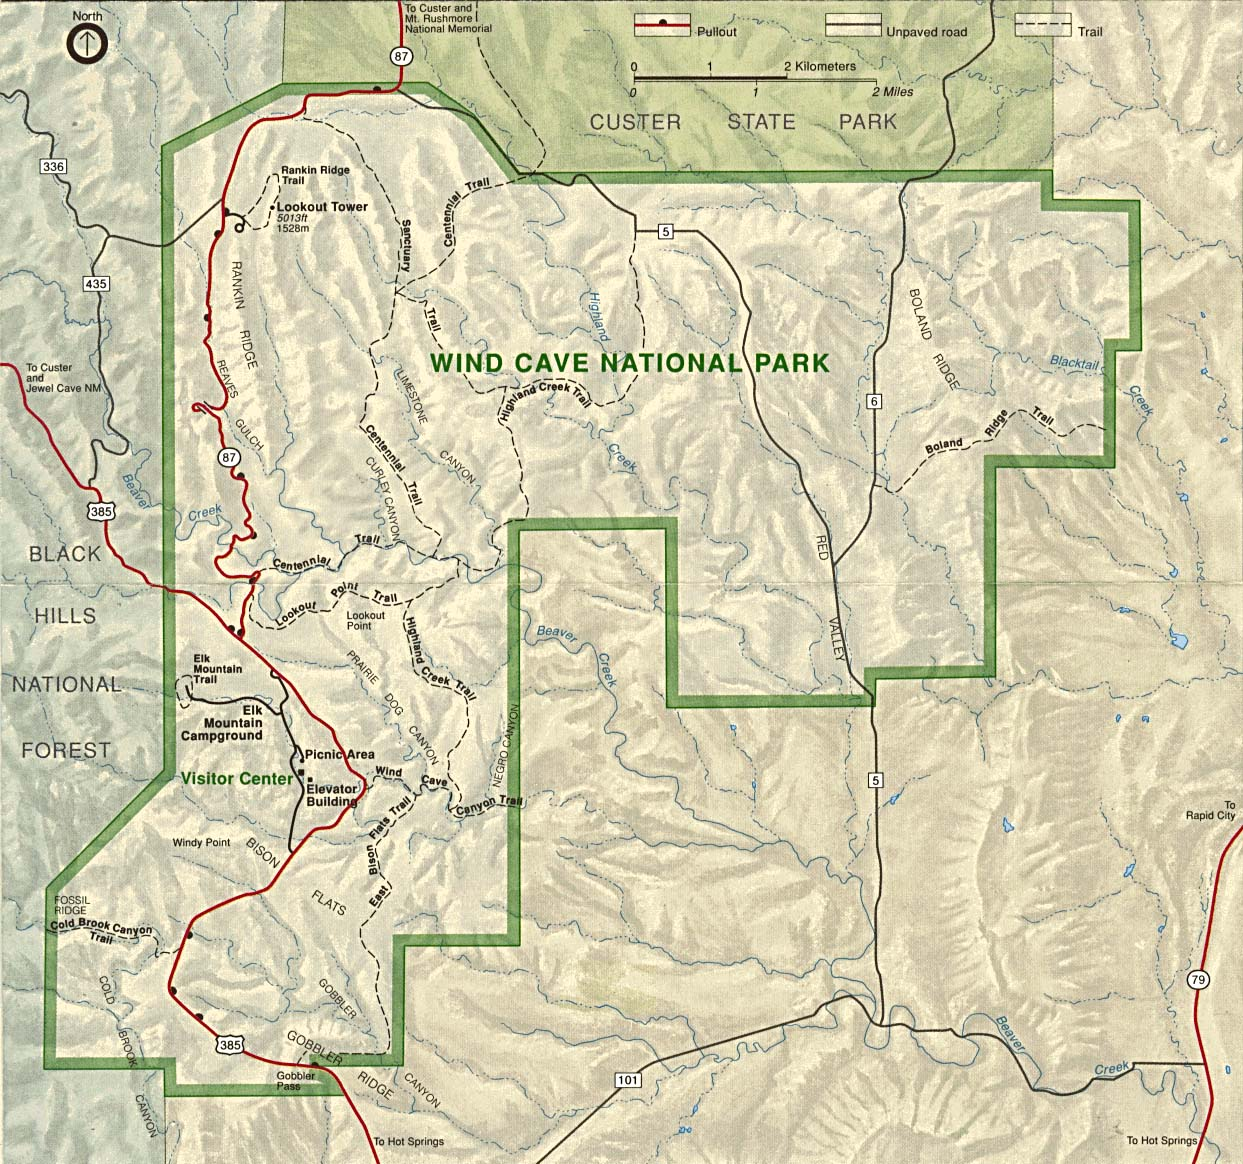 Wind Cave National Park Map, South Dakota, United States